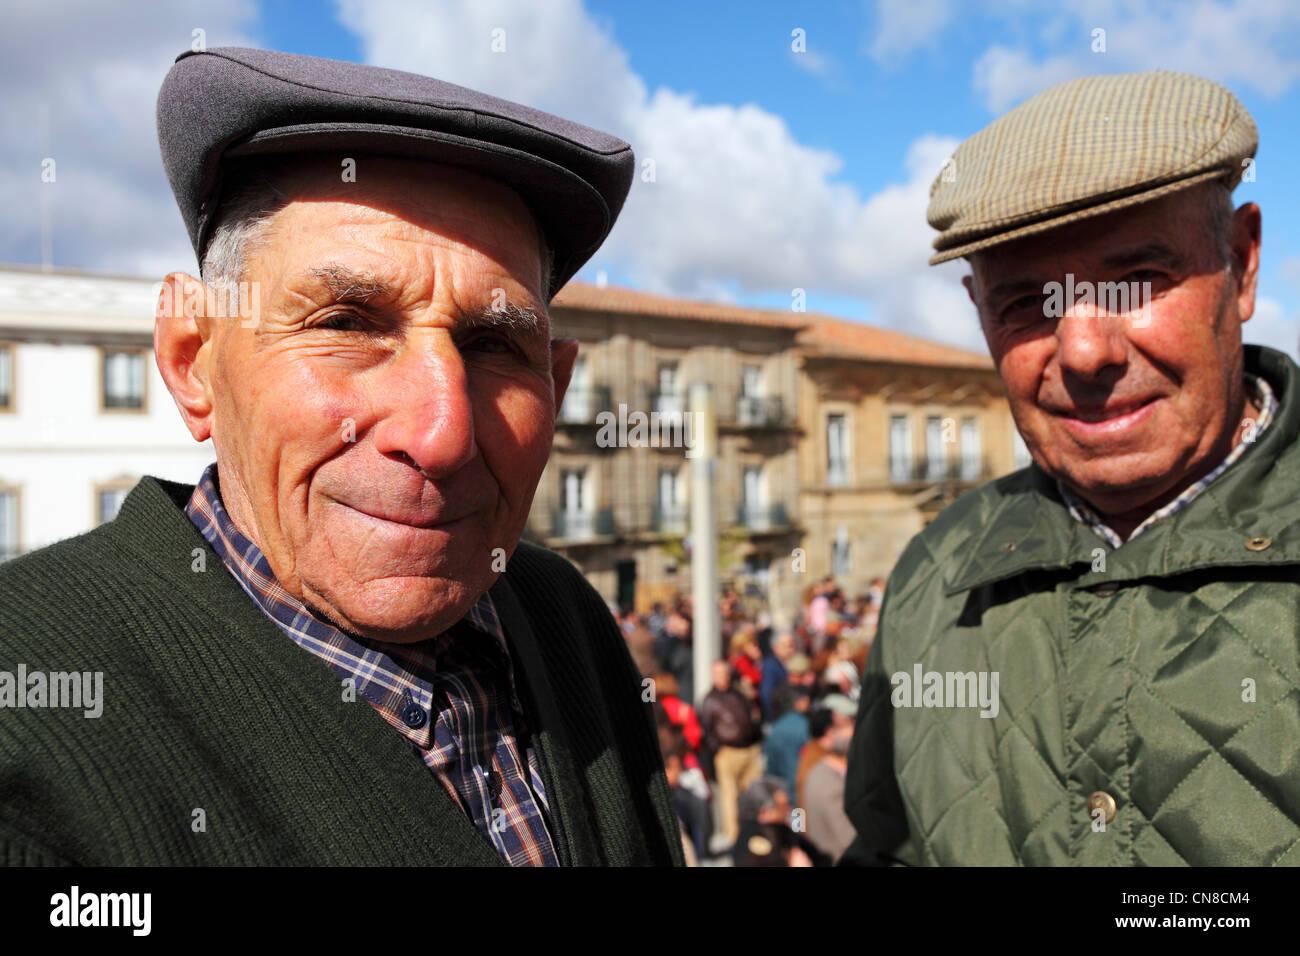 Portuguese men wearing traditional flat caps in Castelo de Vide ... d6038c8a058